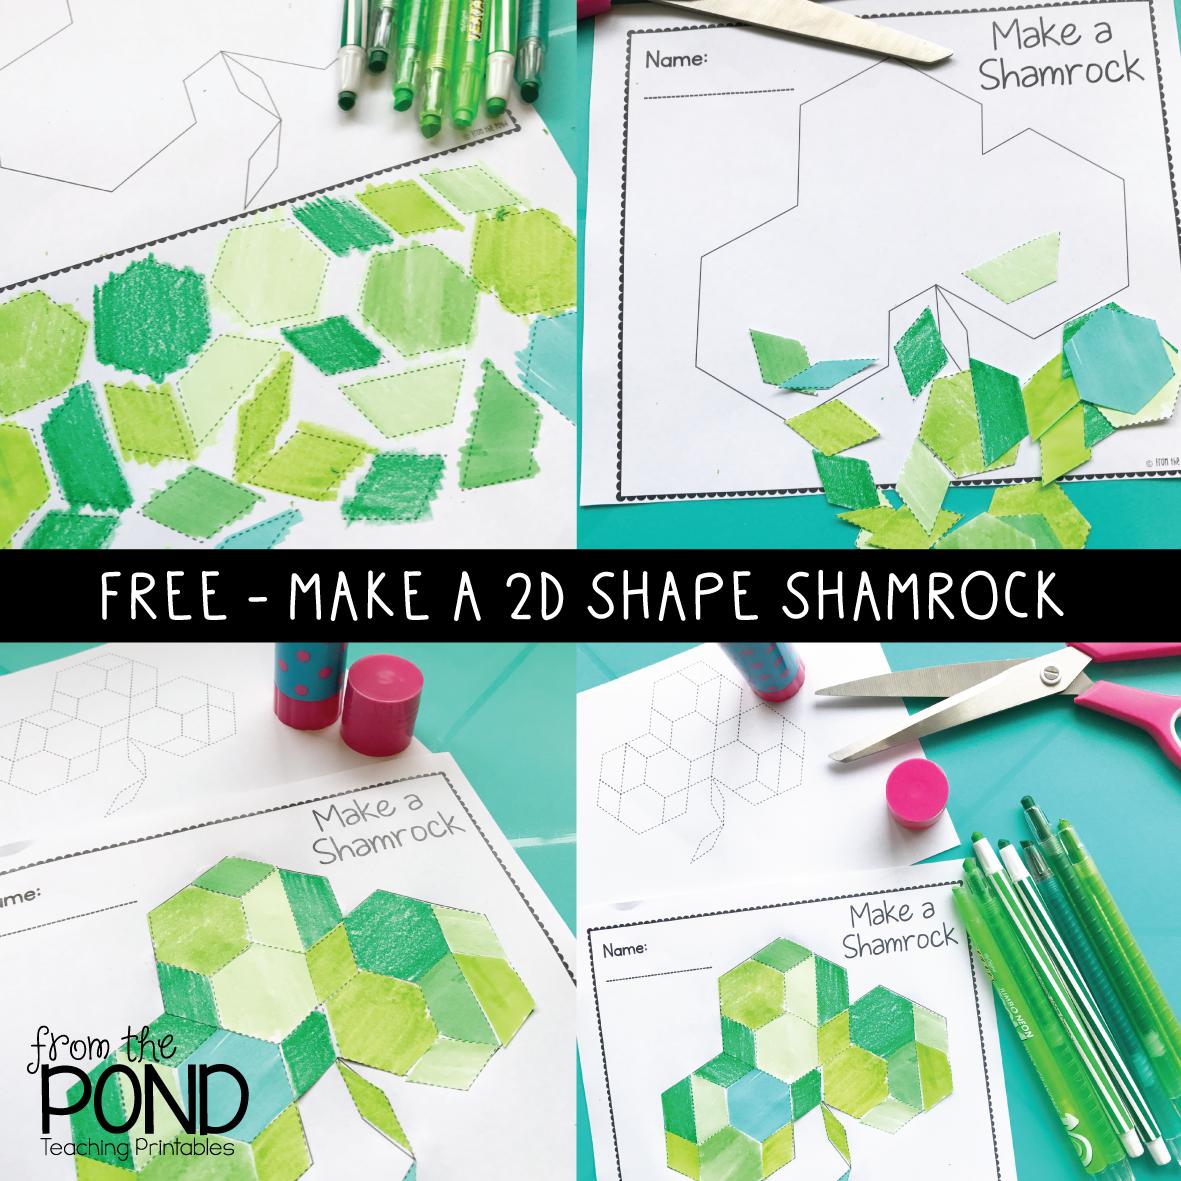 2D Shape Shamrock with Pattern Block Shapes   Classroom   Pinterest